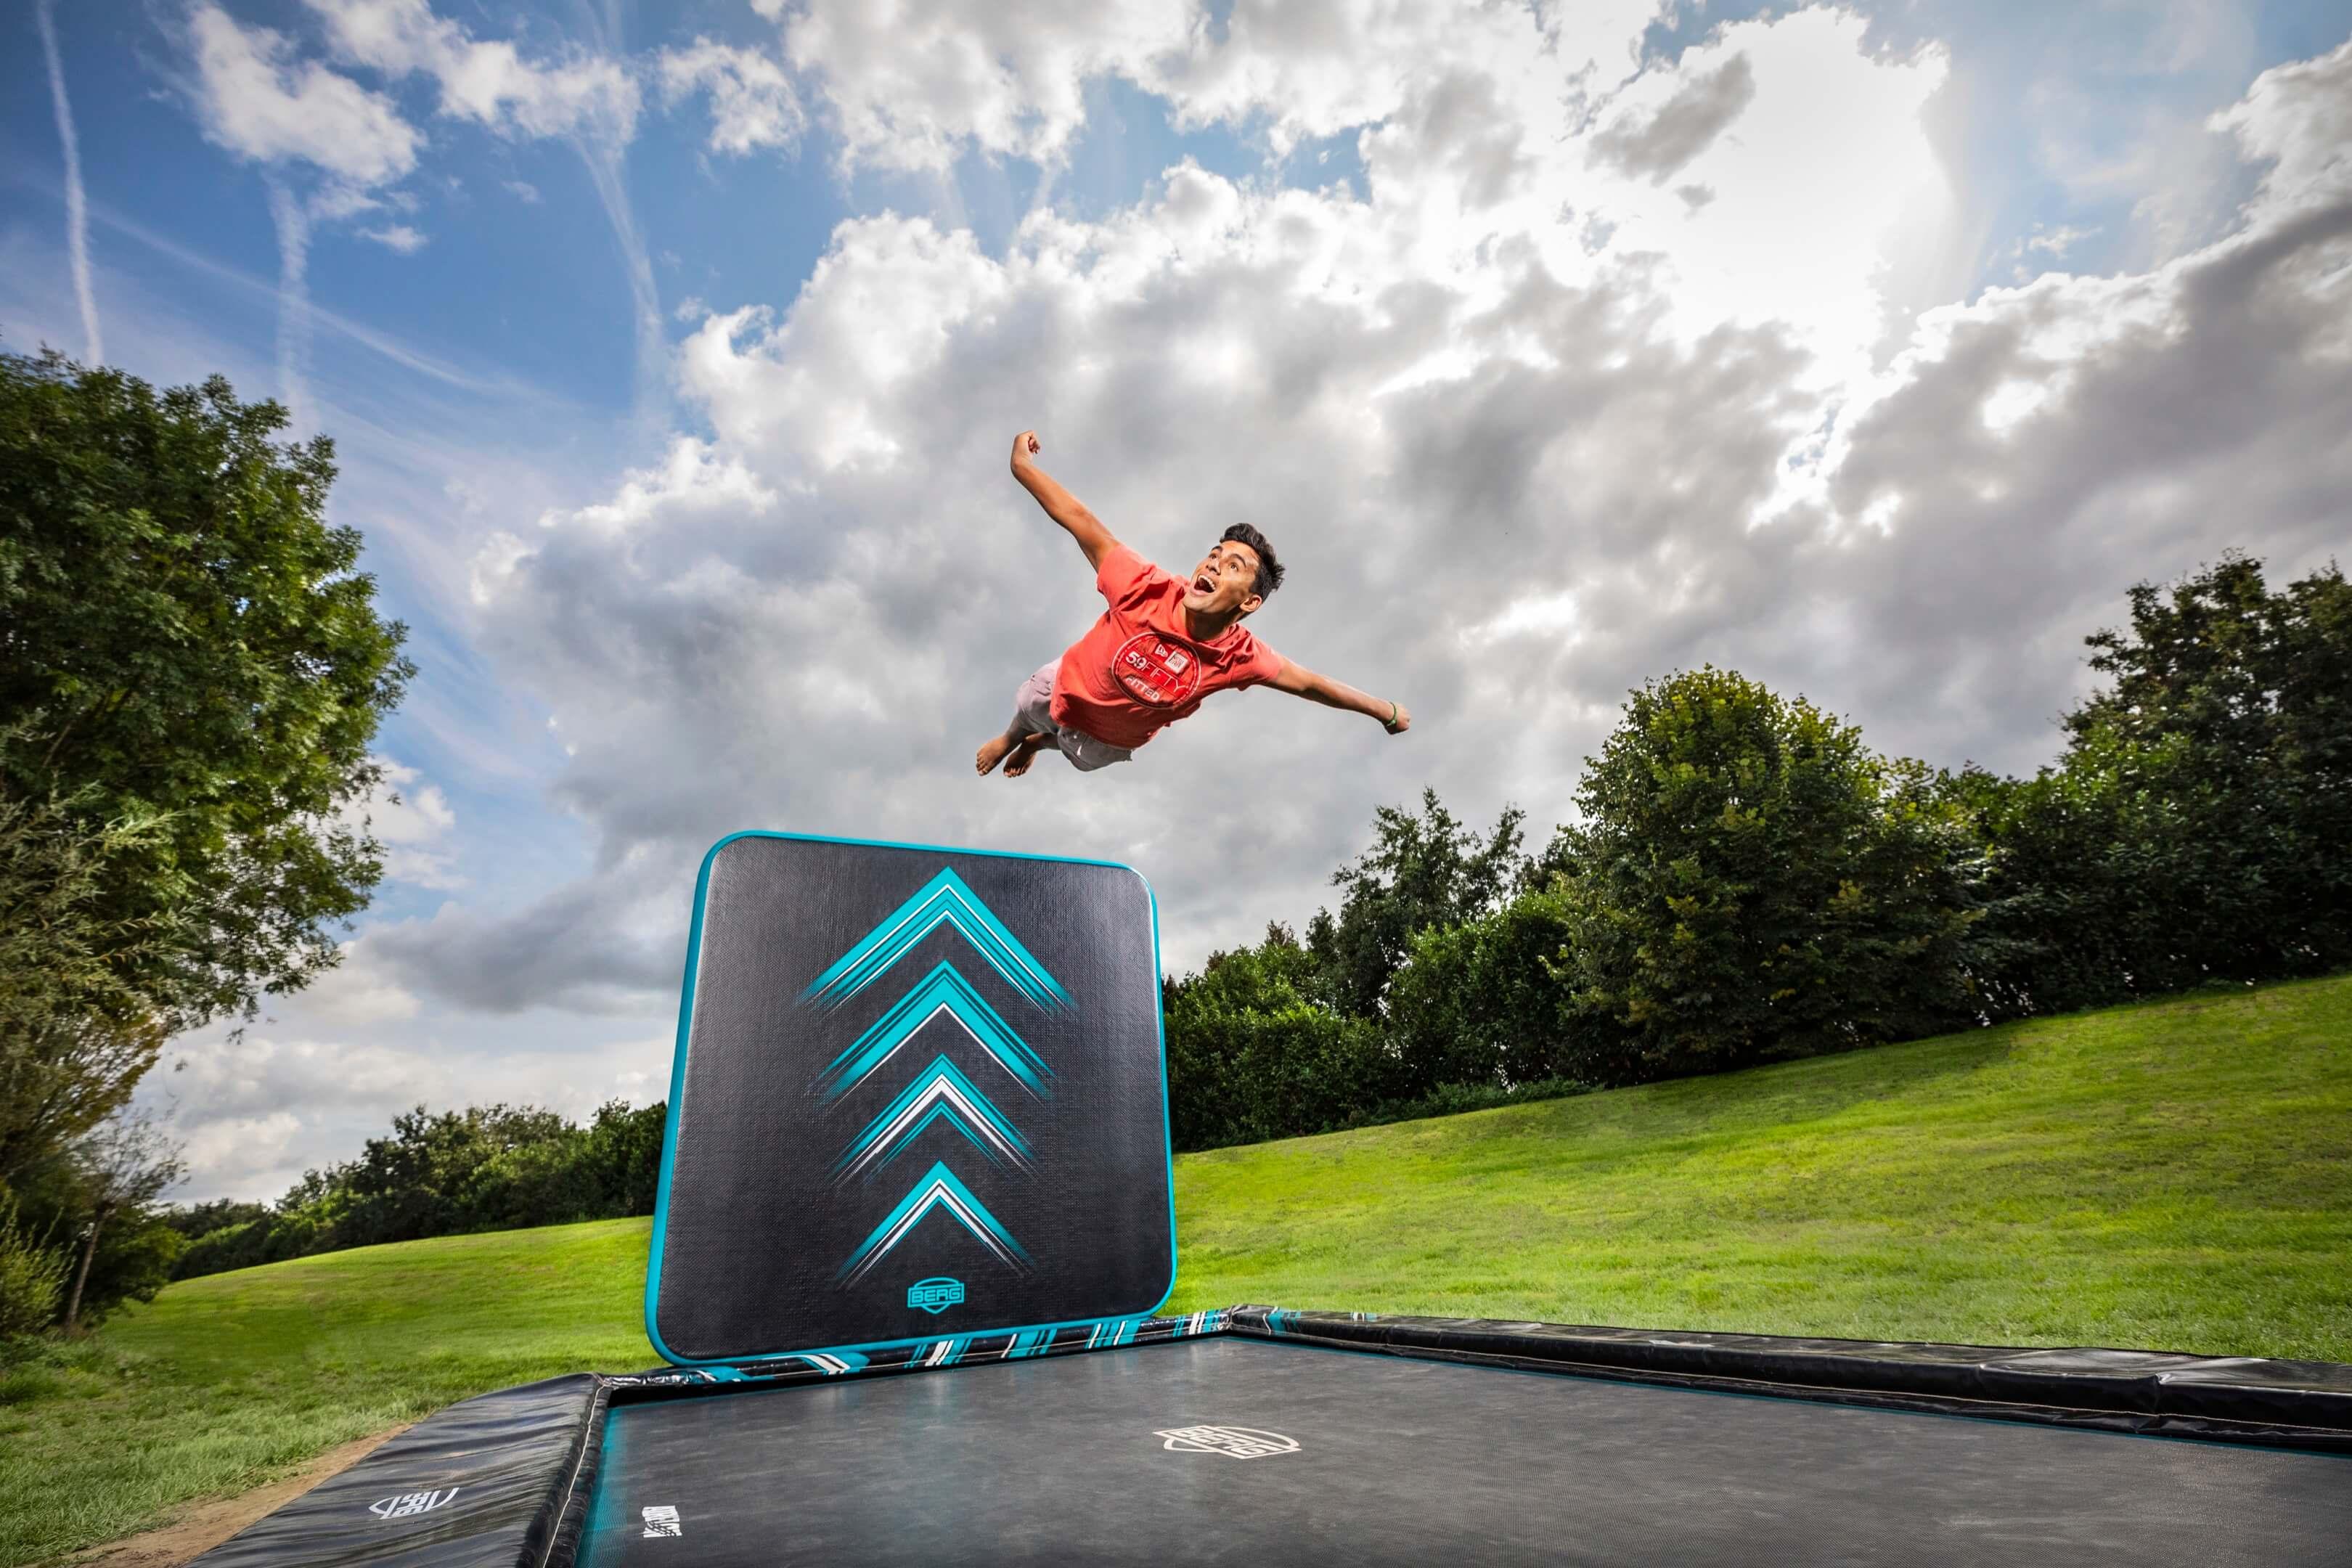 Jurjen Poeles fotografie Berg Toys trampoline sport speelgoed actief buiten lifestyle outdoor extreme